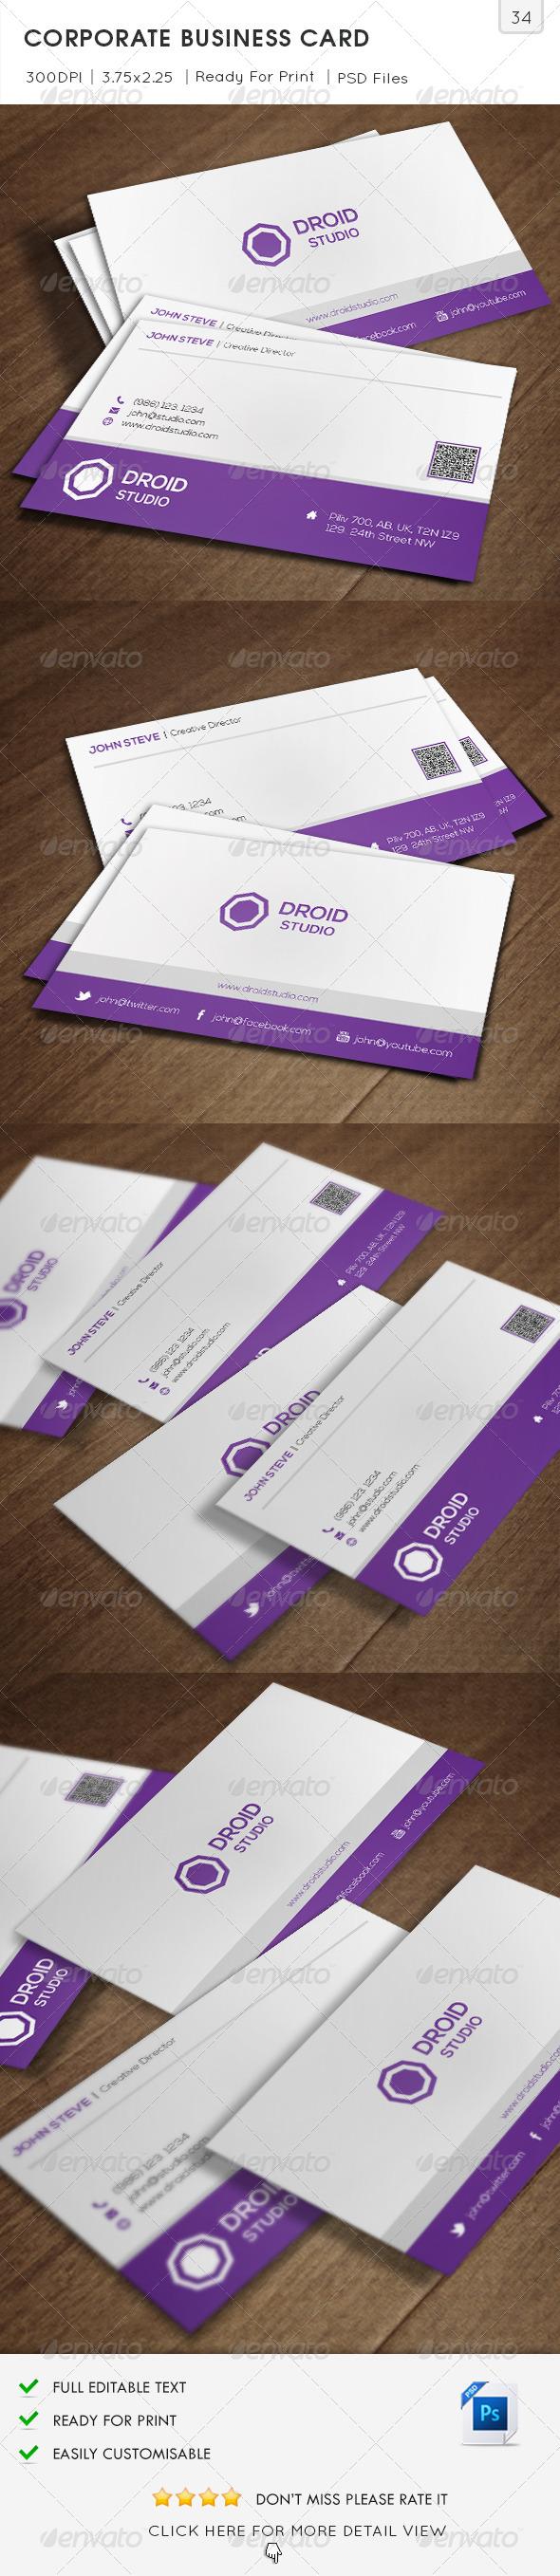 Corporate Business Card v34 - Corporate Business Cards